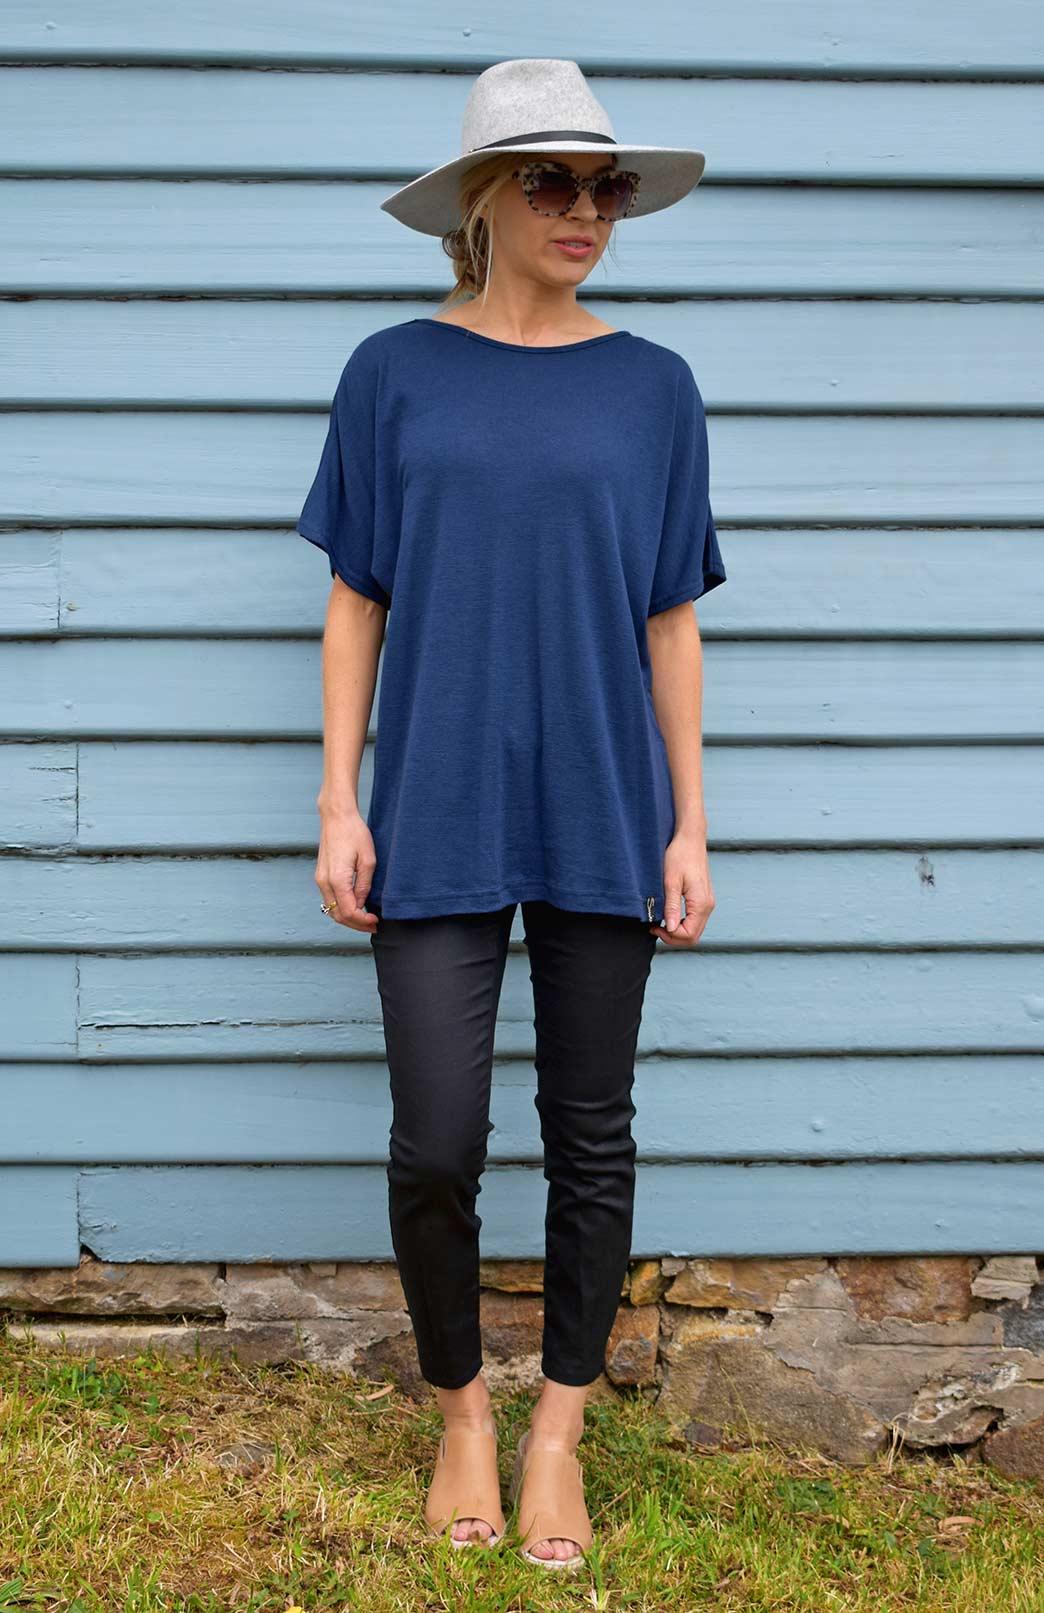 Loose T-Shirt - Women's Loose Wool Indigo Blue Summer Top - Smitten Merino Tasmania Australia